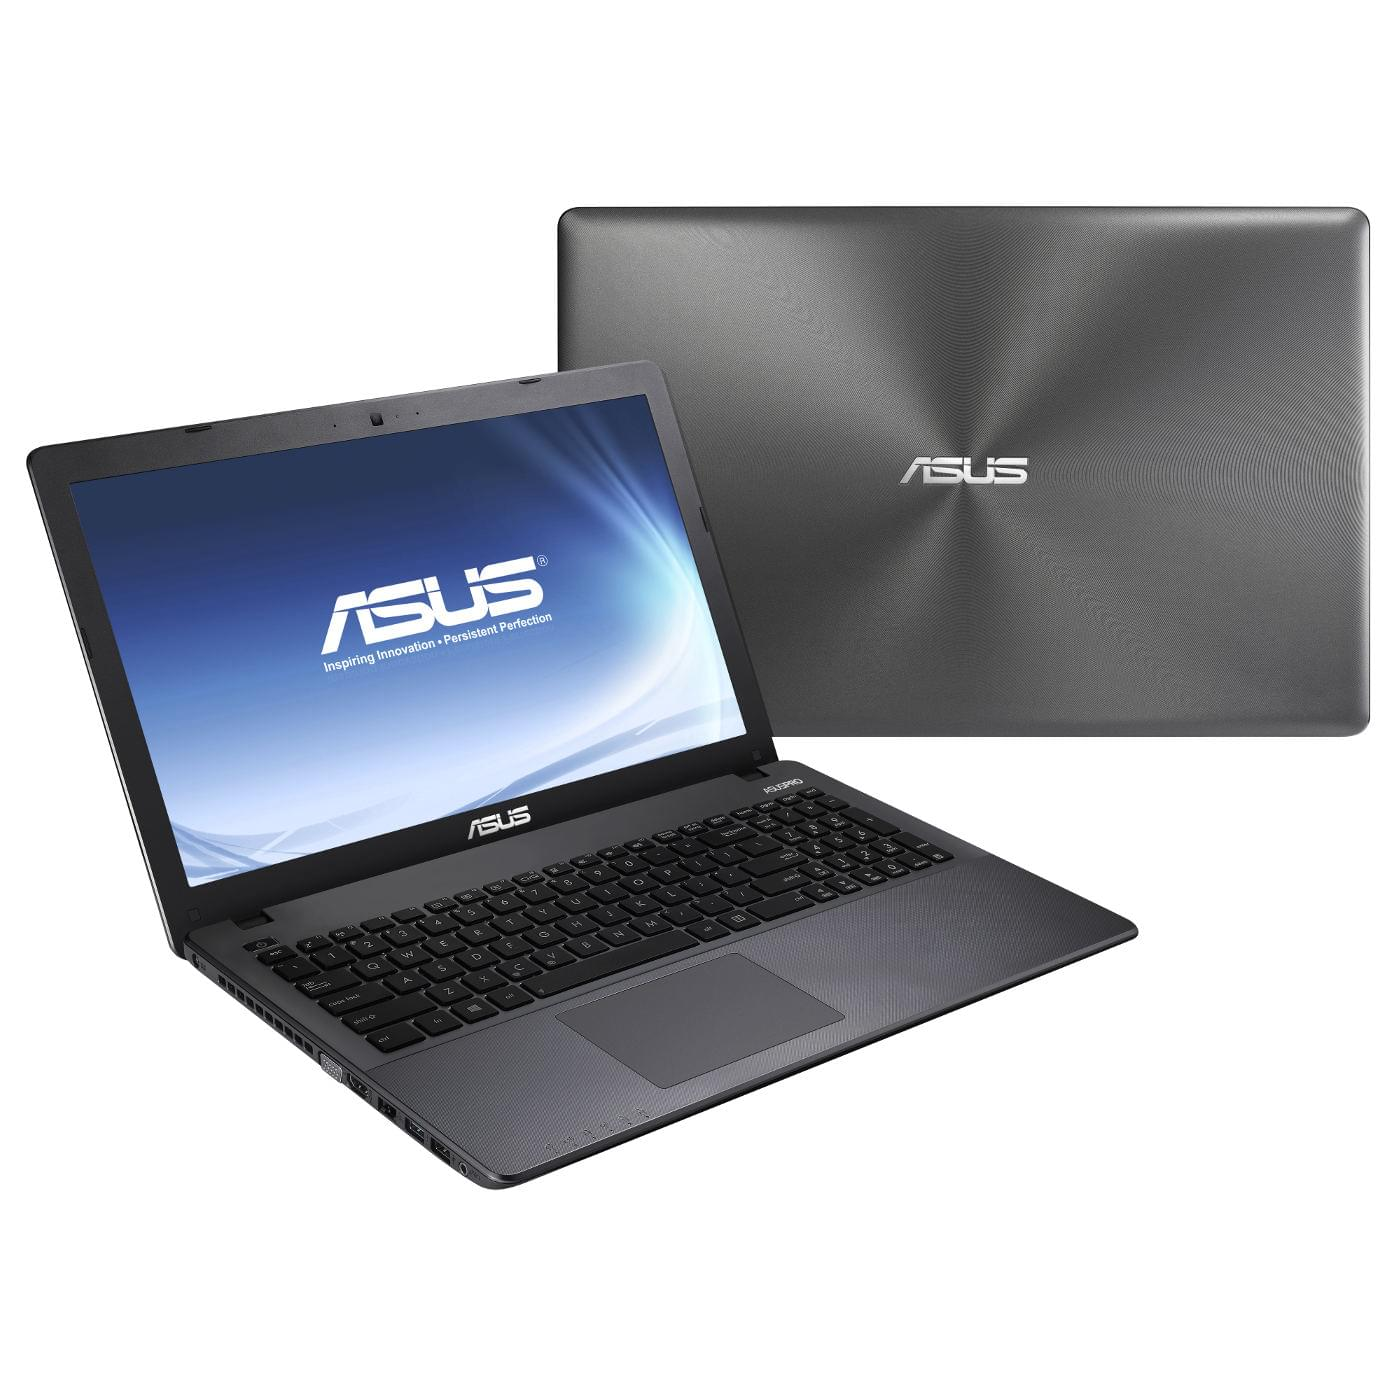 Asus P550LAV-XO429G (P550LAV-XO429G) - Achat / Vente PC Portable sur Cybertek.fr - 0